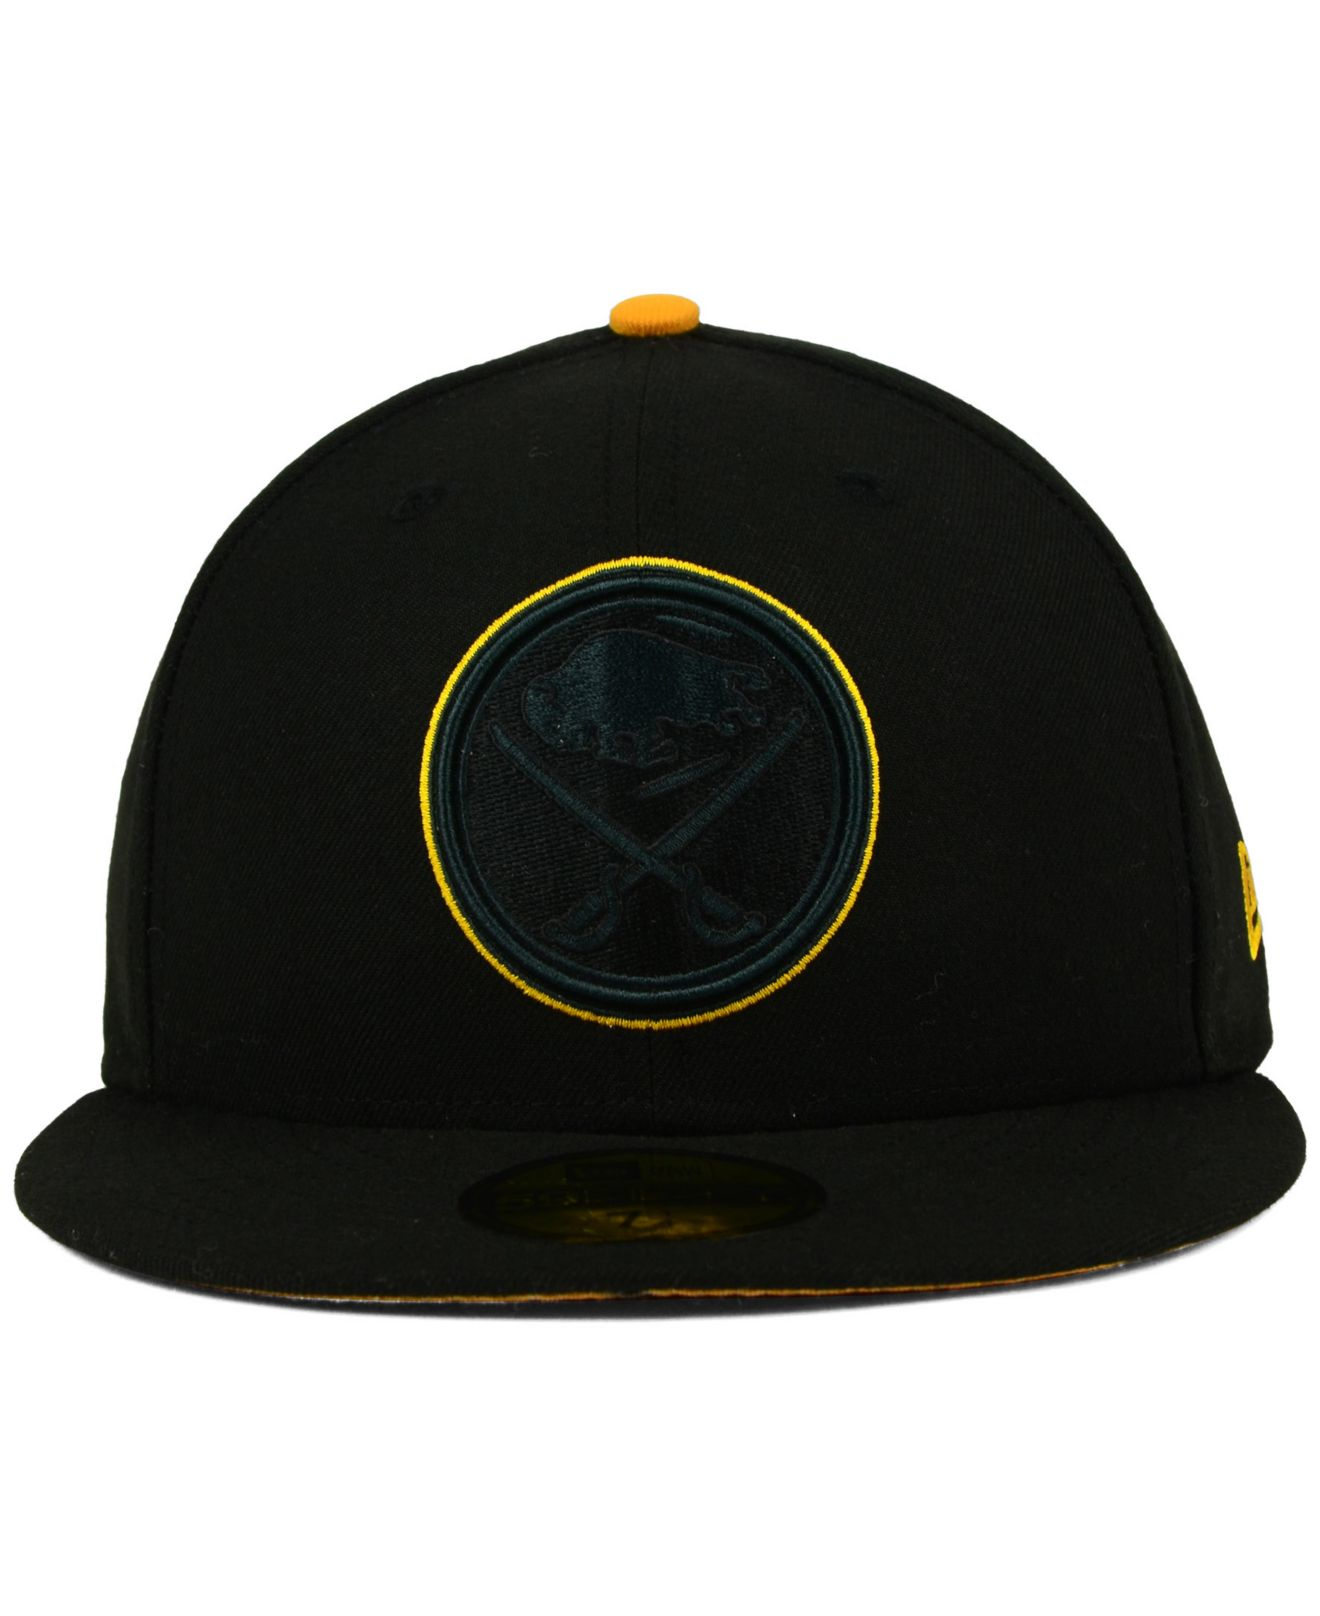 b90d24ee4da ... norway lyst ktz buffalo sabres pop flip 59fifty cap in black for men  6d675 6e1e3